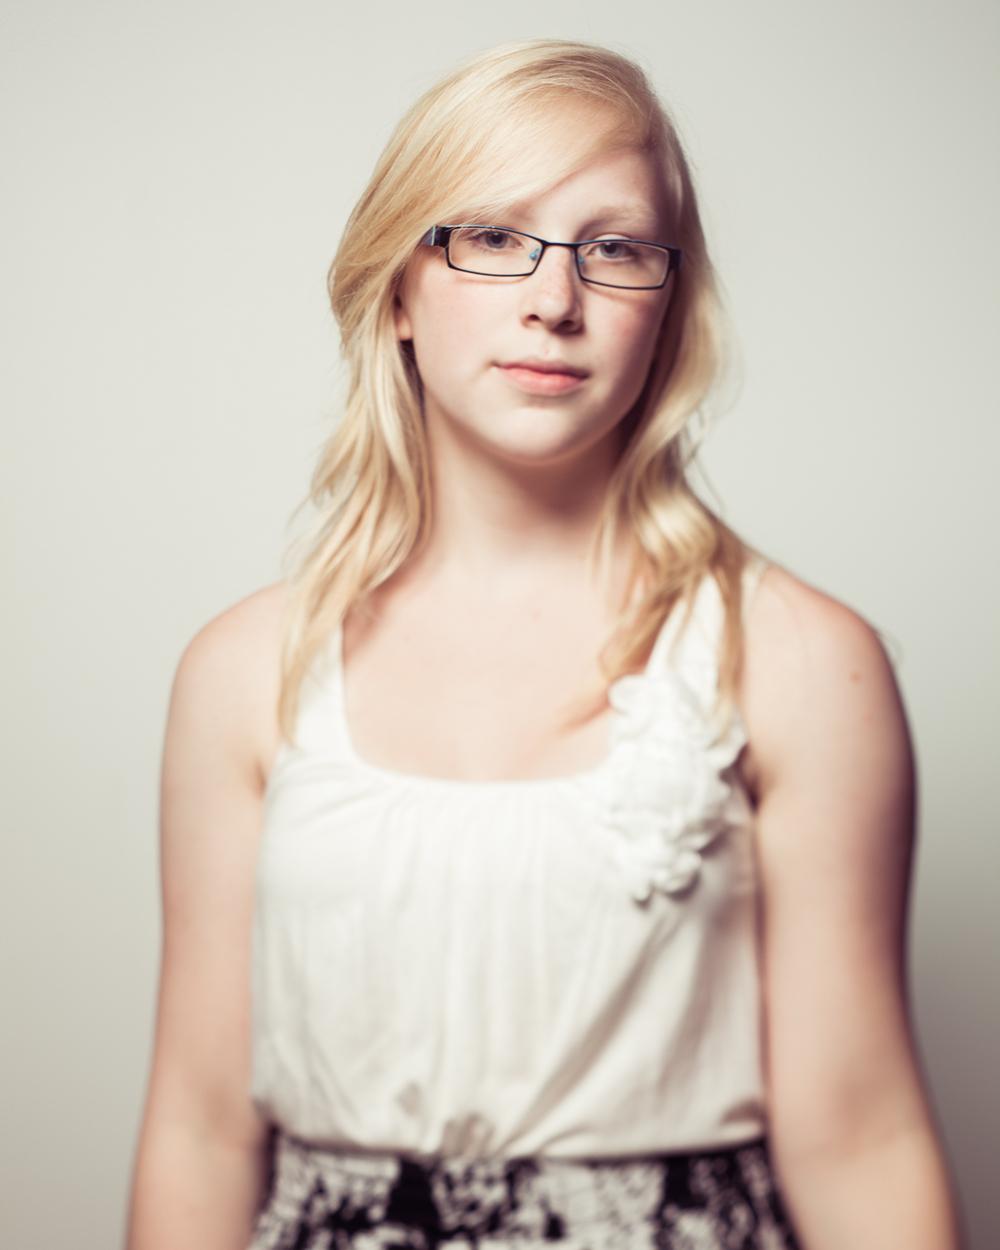 Portrait - Girl